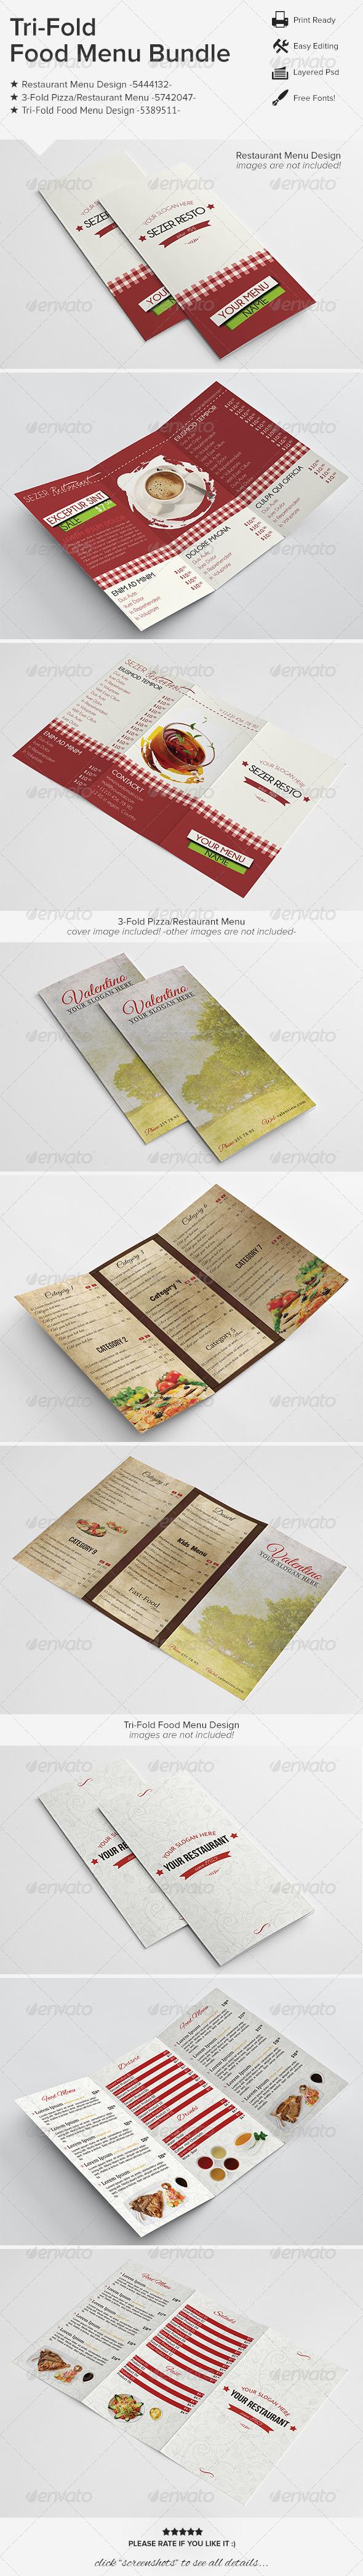 Tri-Fold Food Menu Bundle 01 - Food Menus Print Templates